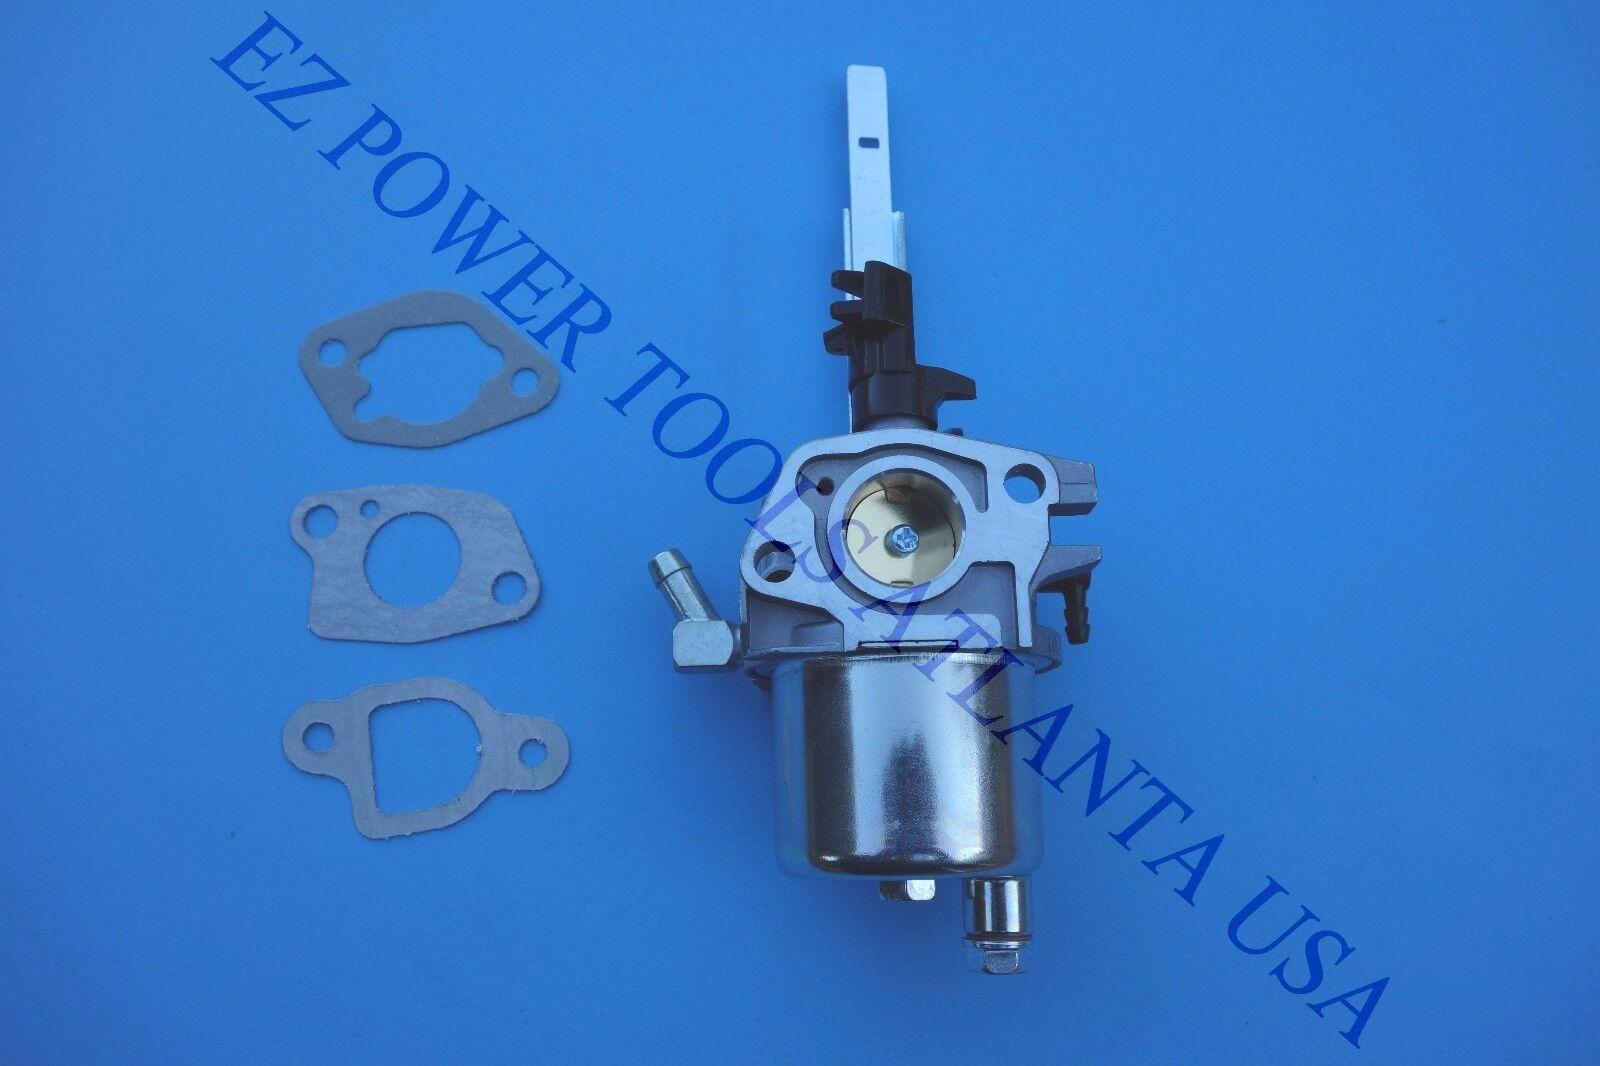 Ariens Sno-Tek ST24 920400 920402 208CC 24 IN Snow Blower Recoil Starter Type A